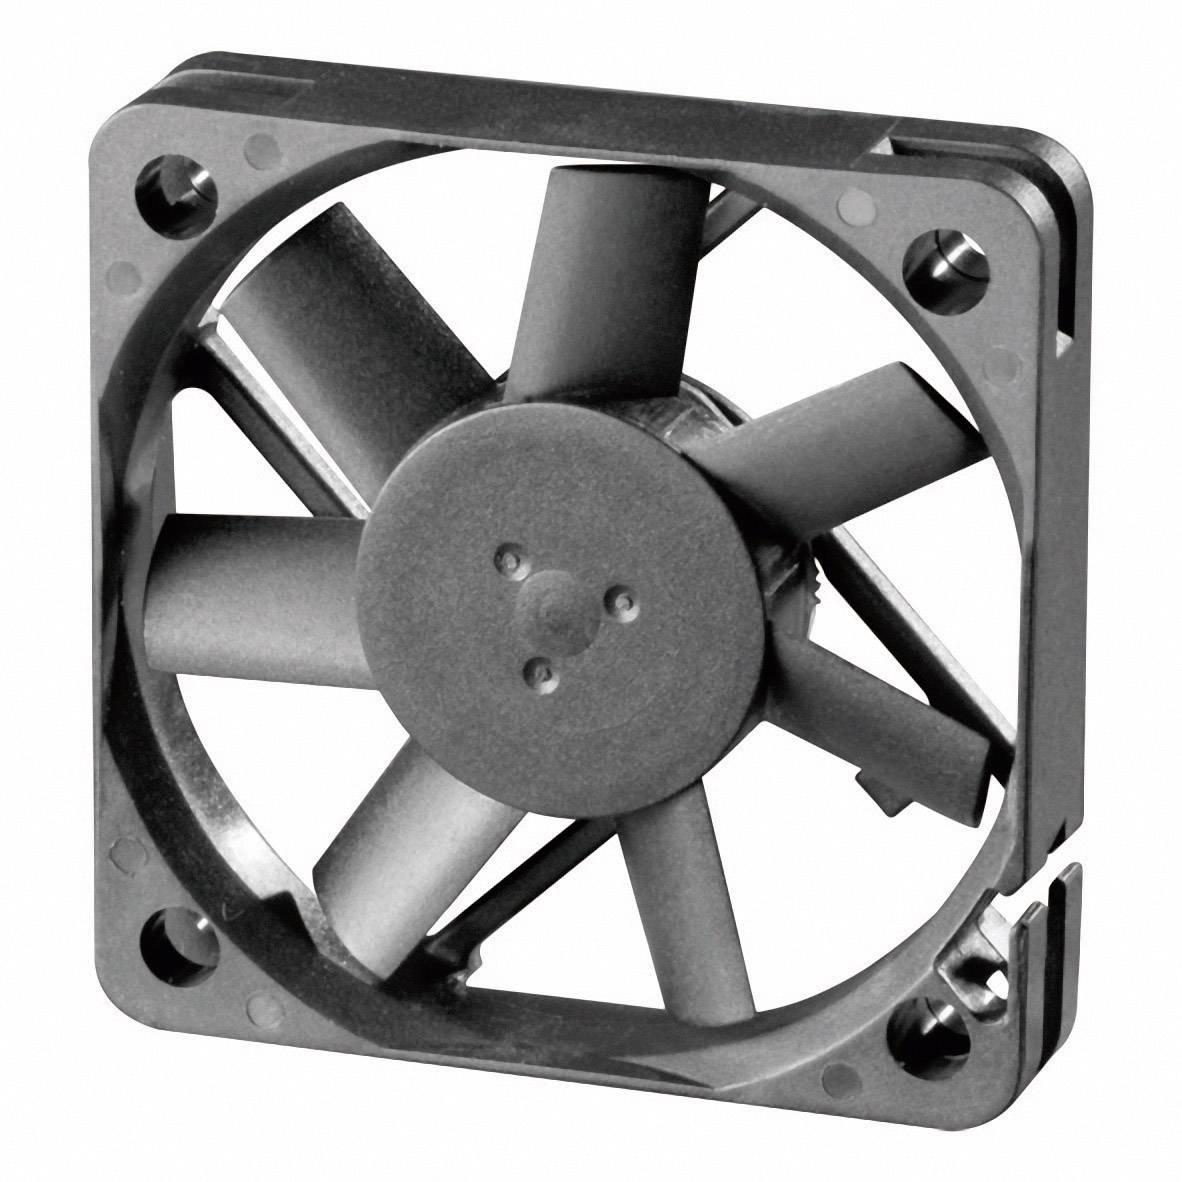 Ventilátor Sunon DR MB50101V2-0000-A99, 50 x 50 x 10 mm, 12 V/DC